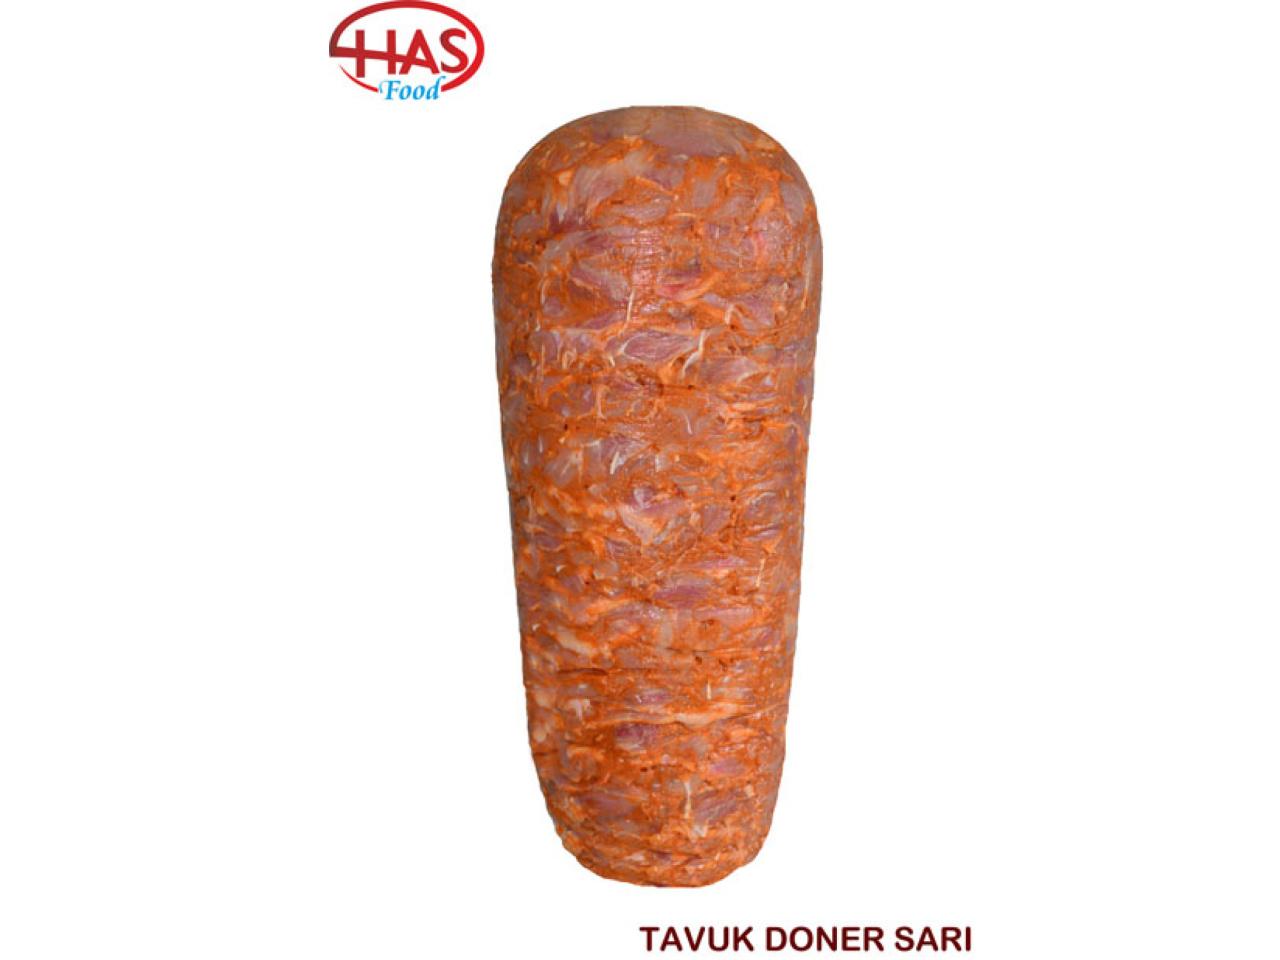 Tavuk Doner Sari